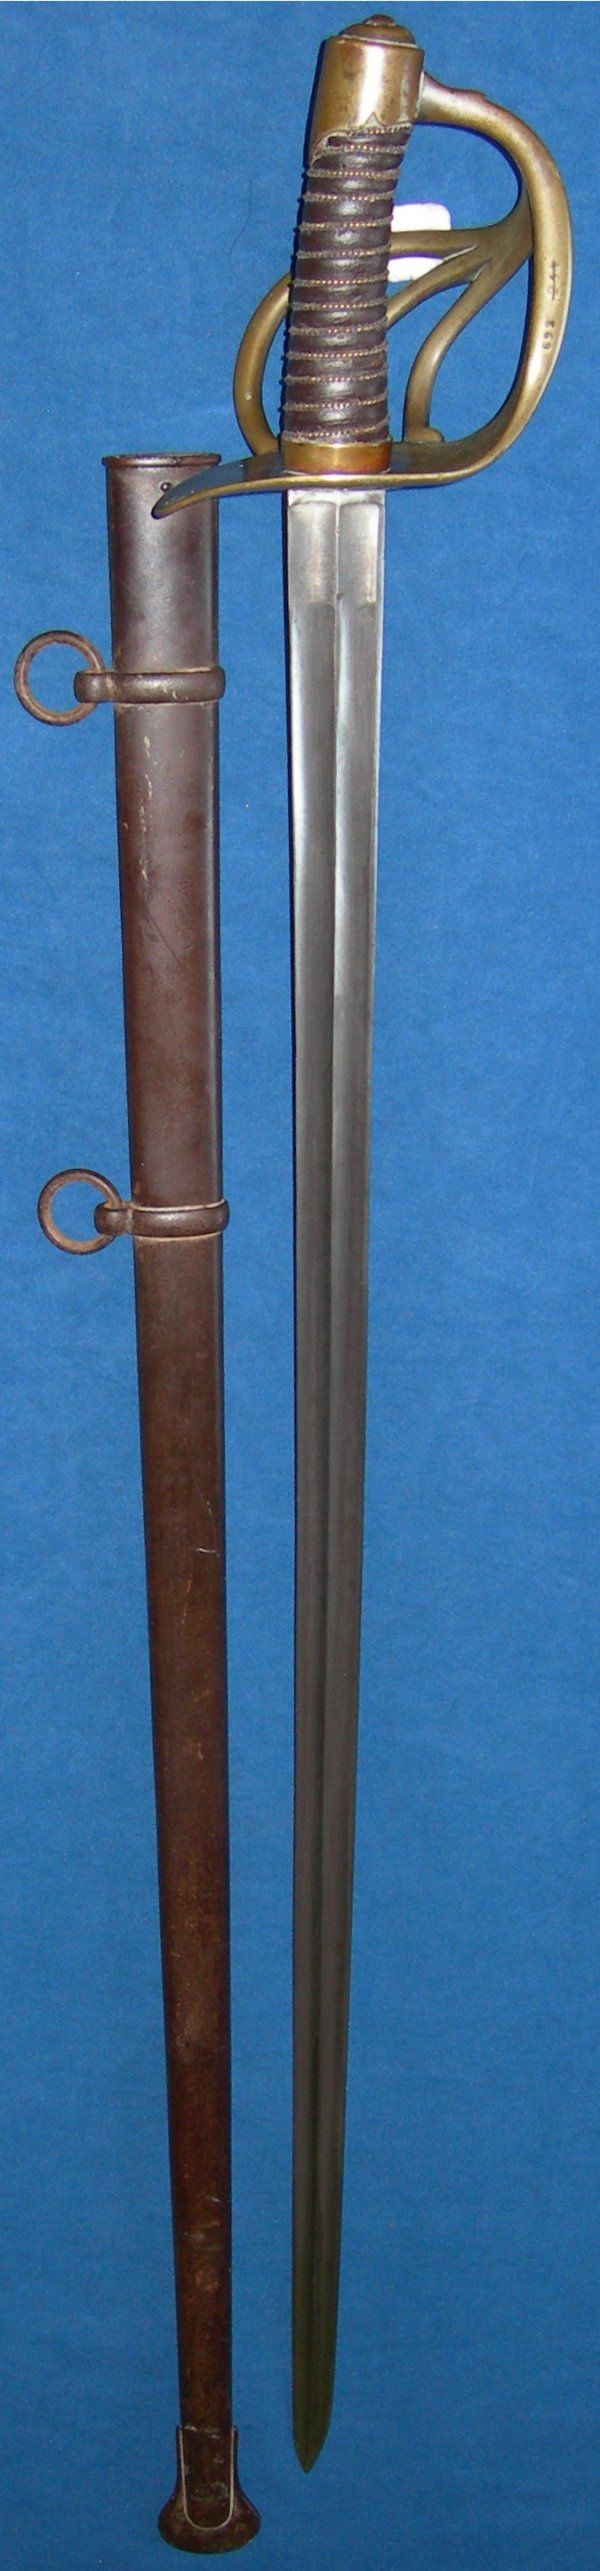 Battle of Waterloo trophy, French Heavy Cavalry Trooper's Sword, Klingenthal, dated 1813